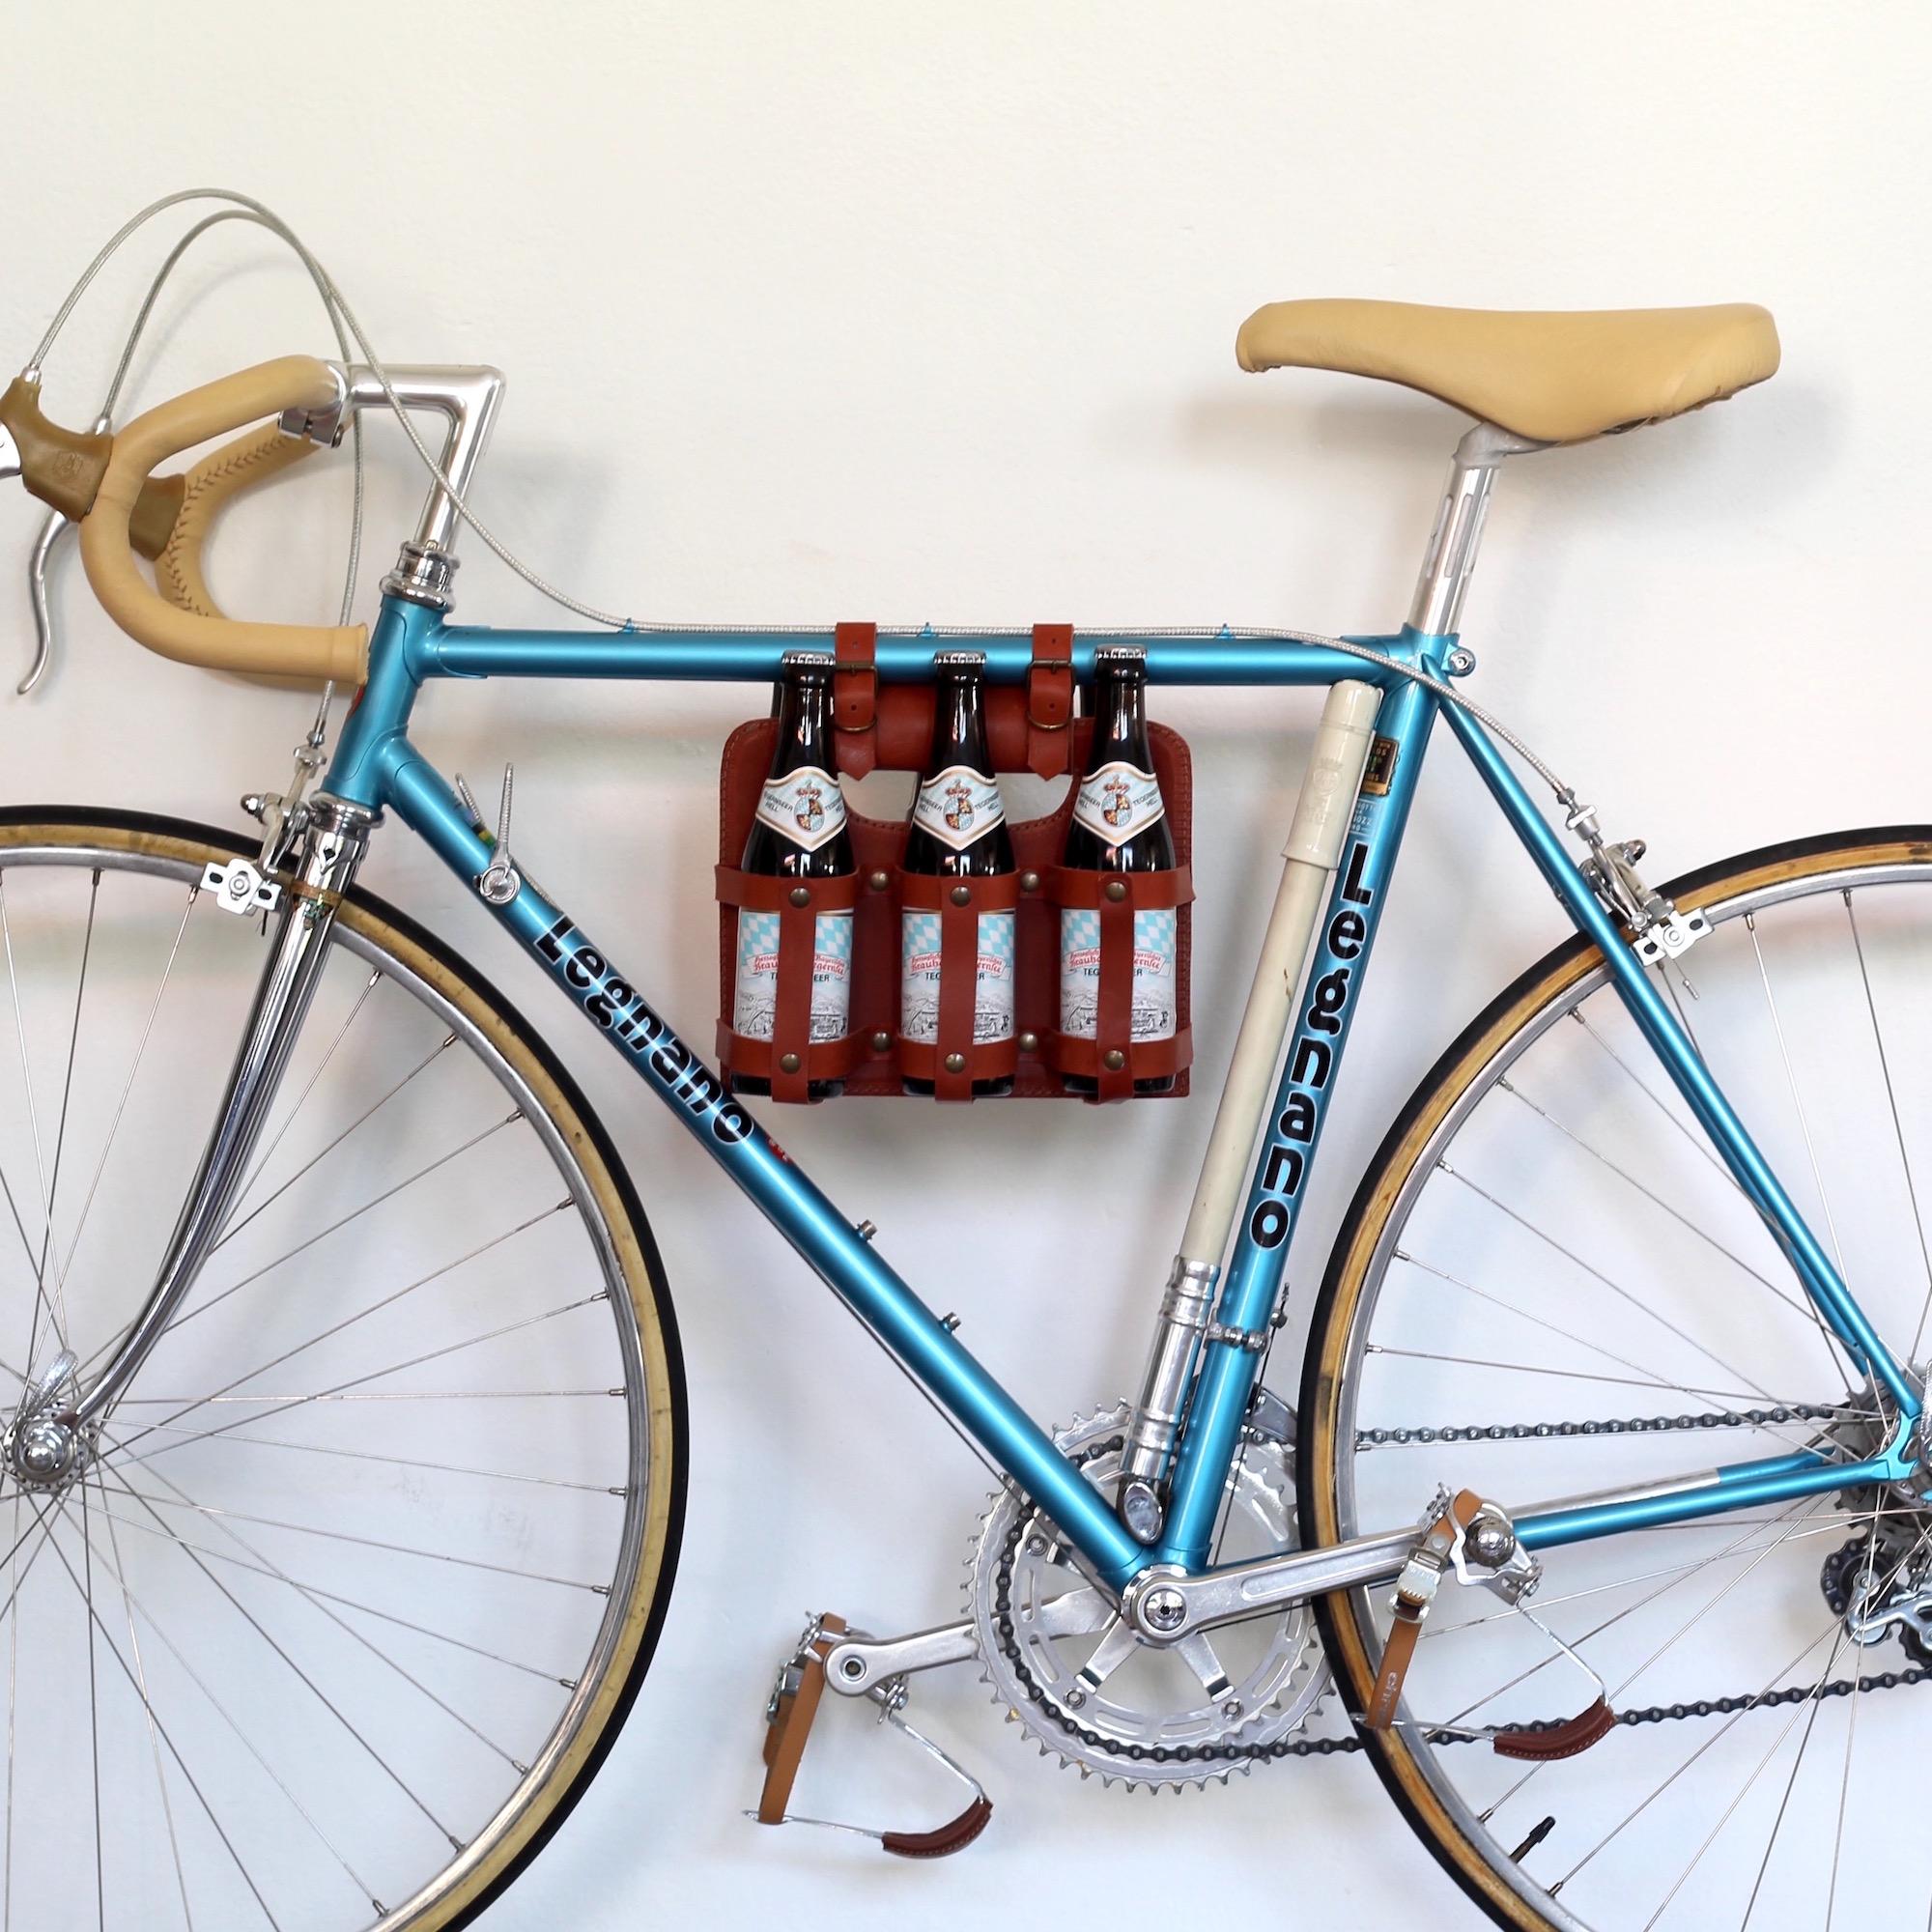 atelier dissegna fahrrad flaschenhalter 0 33l seestrasse7. Black Bedroom Furniture Sets. Home Design Ideas